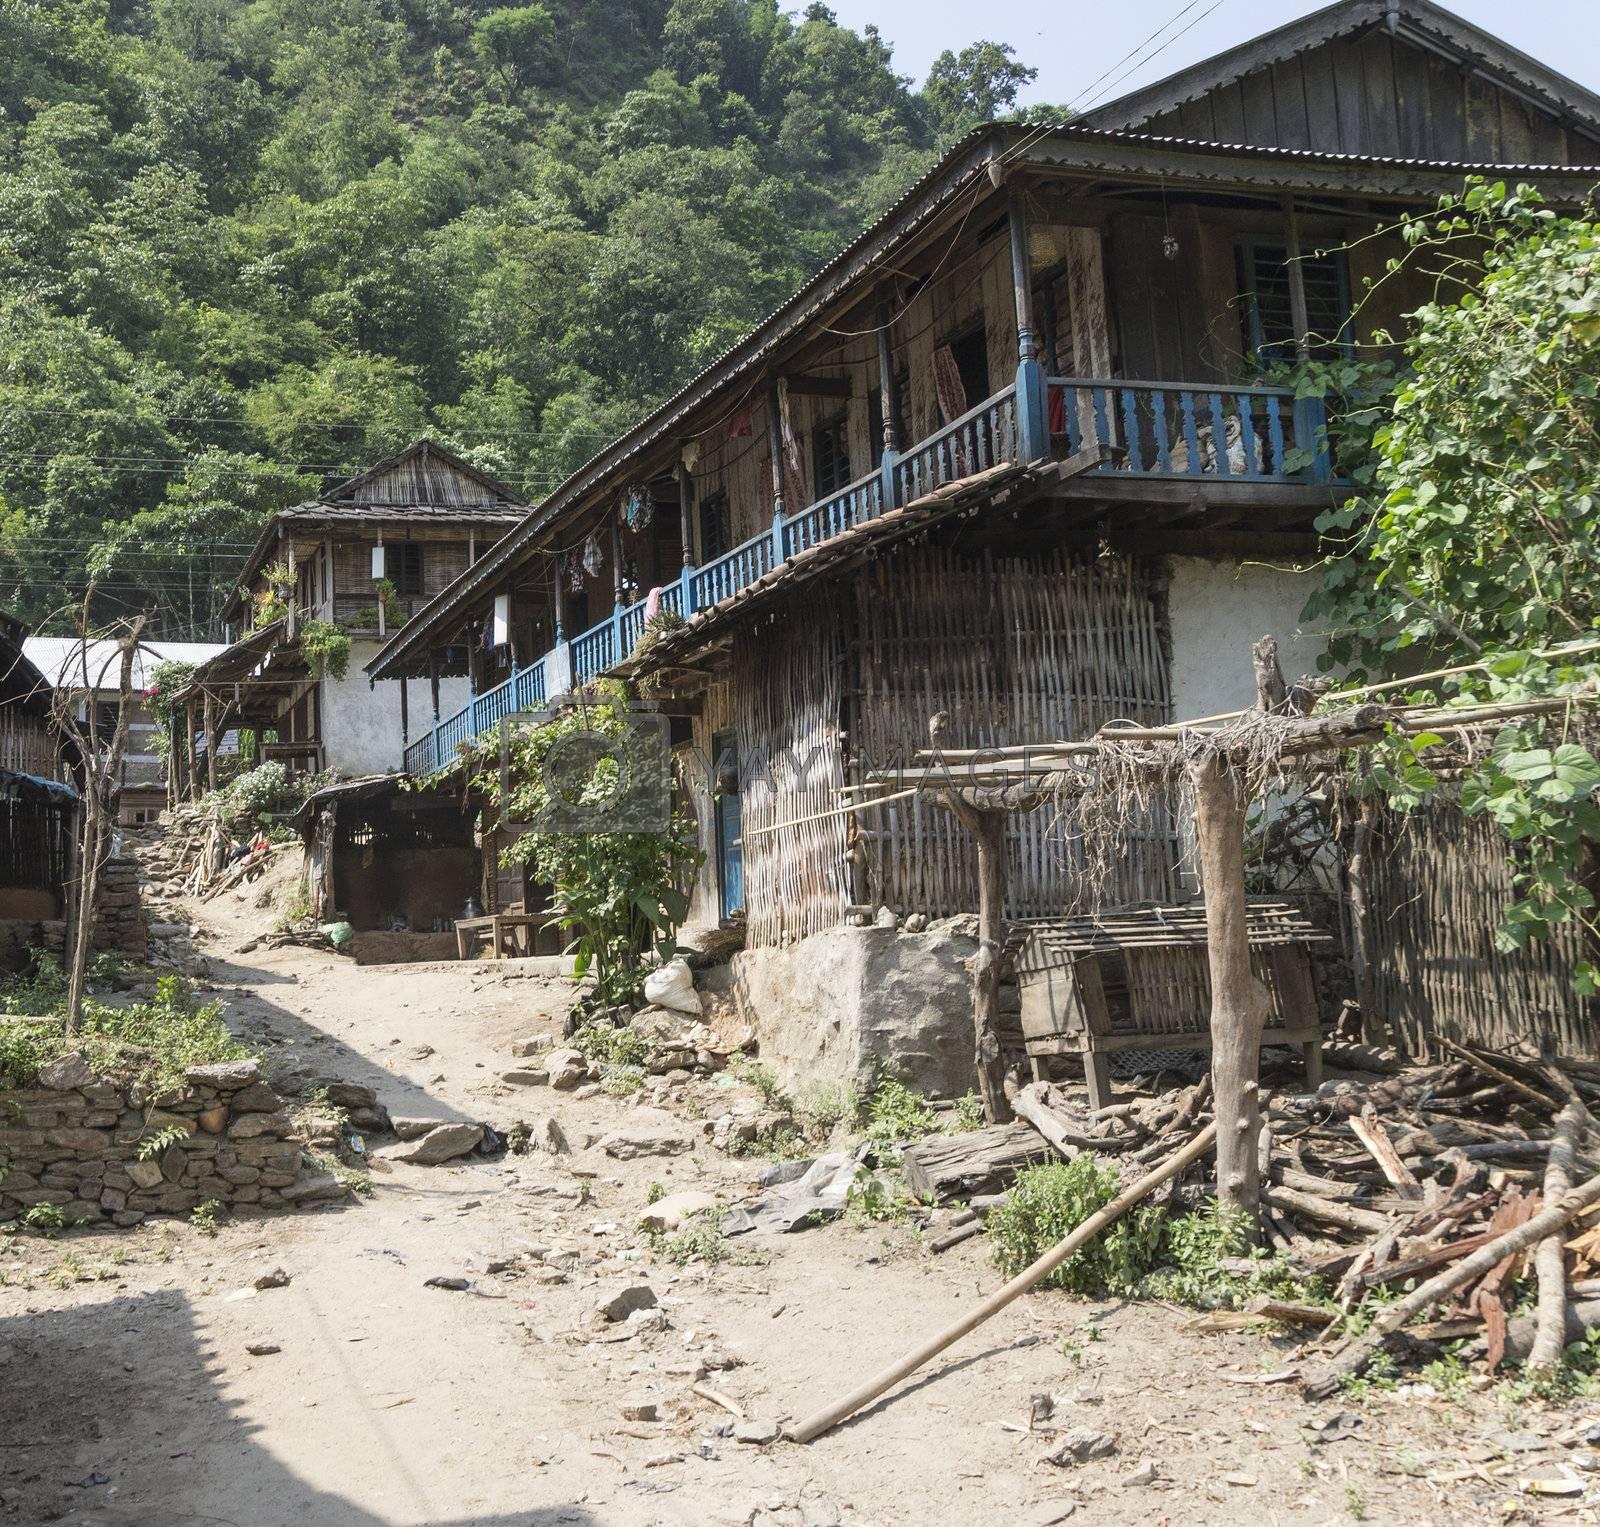 small village in the region sun koshi, nepal by gewoldi